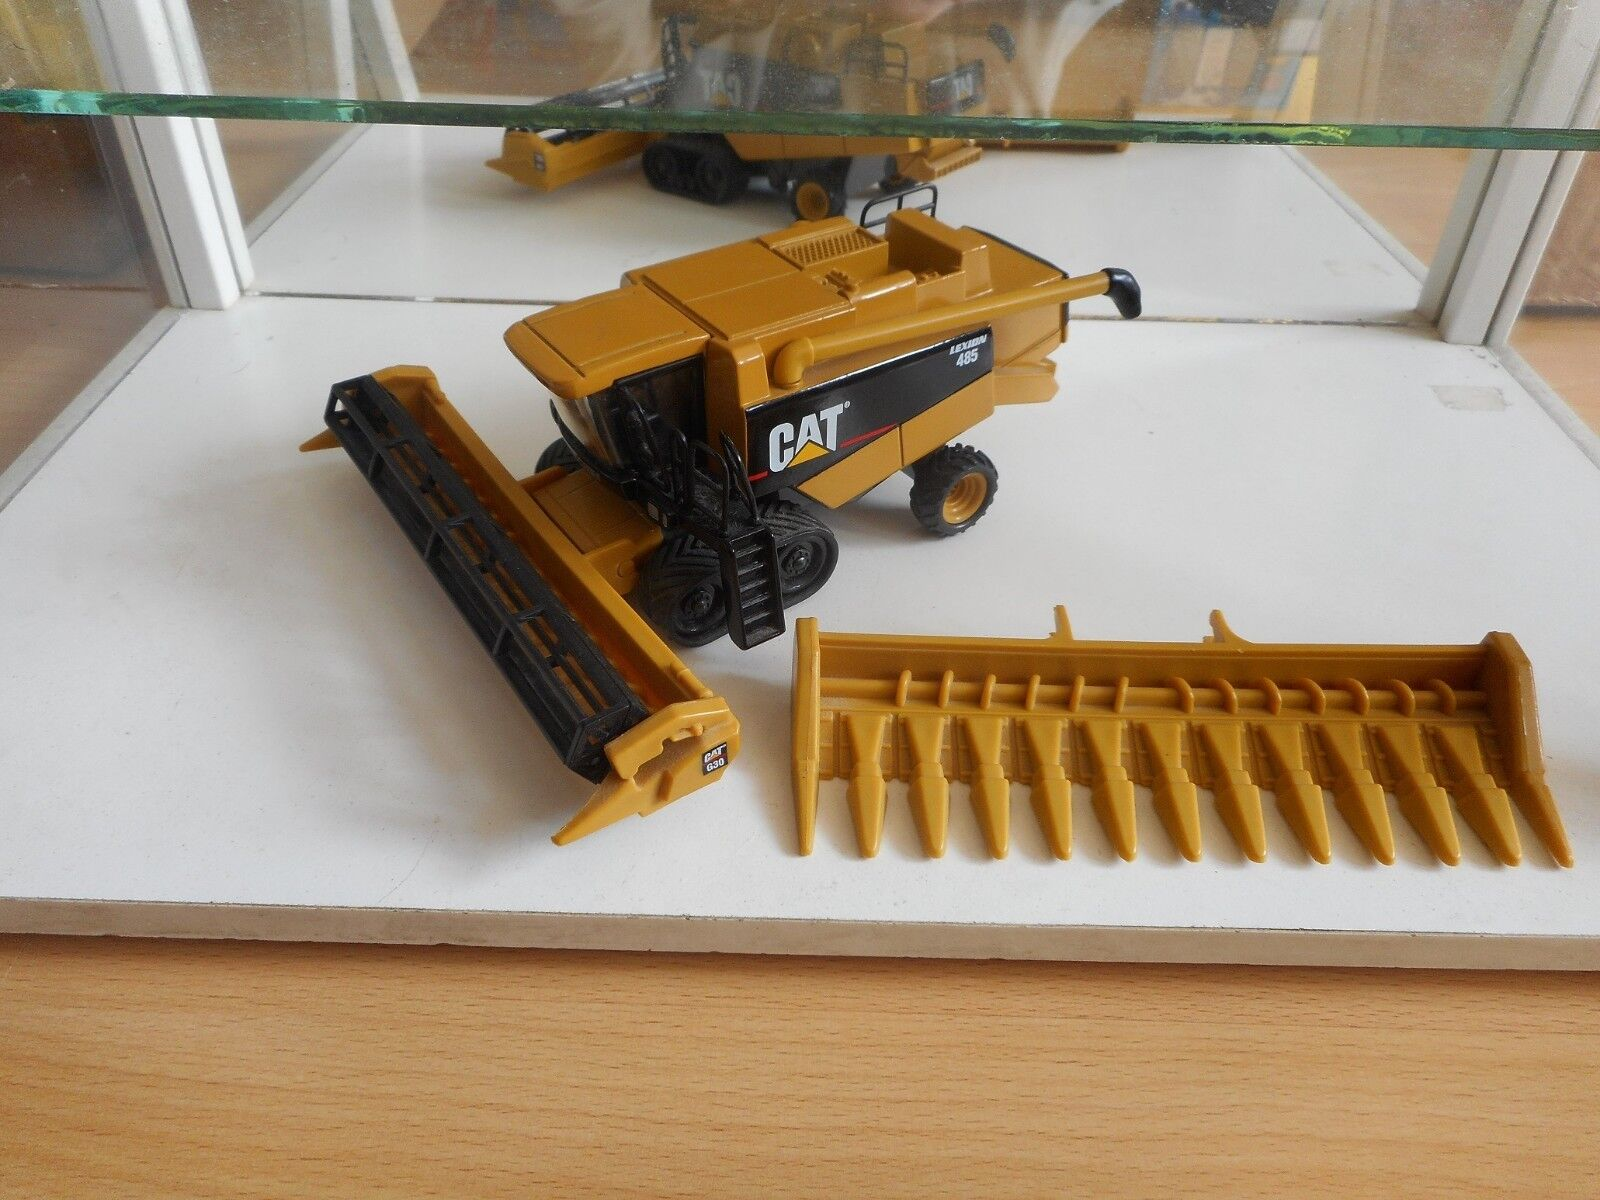 Norscot Catterpillar Cat Lexion 485 in Dark jaune